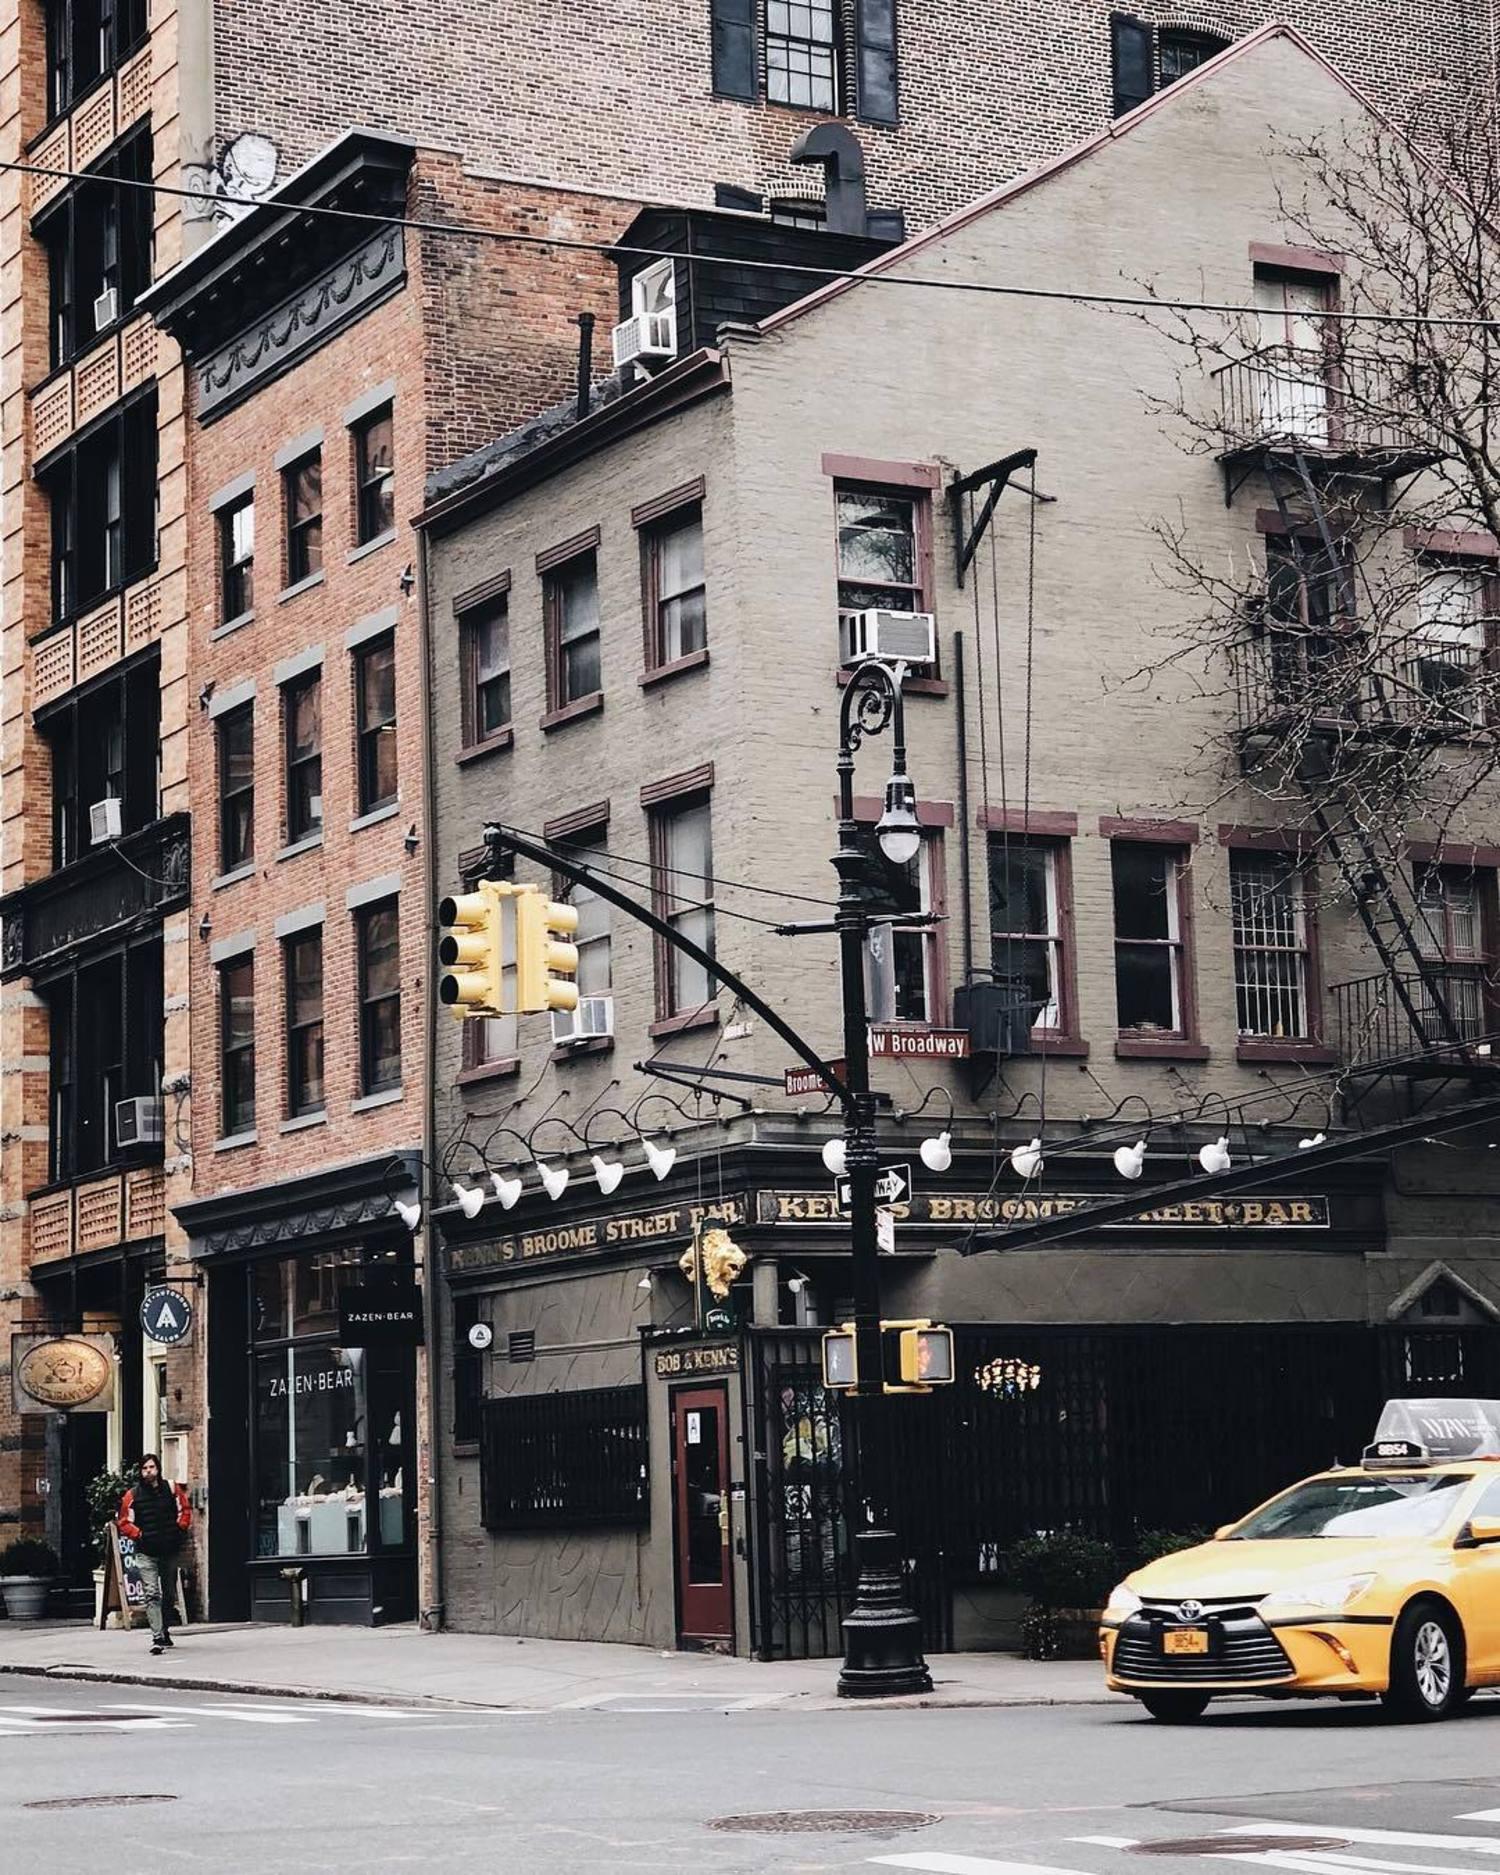 West Broadway & Broome St., SoHo, New York, New York